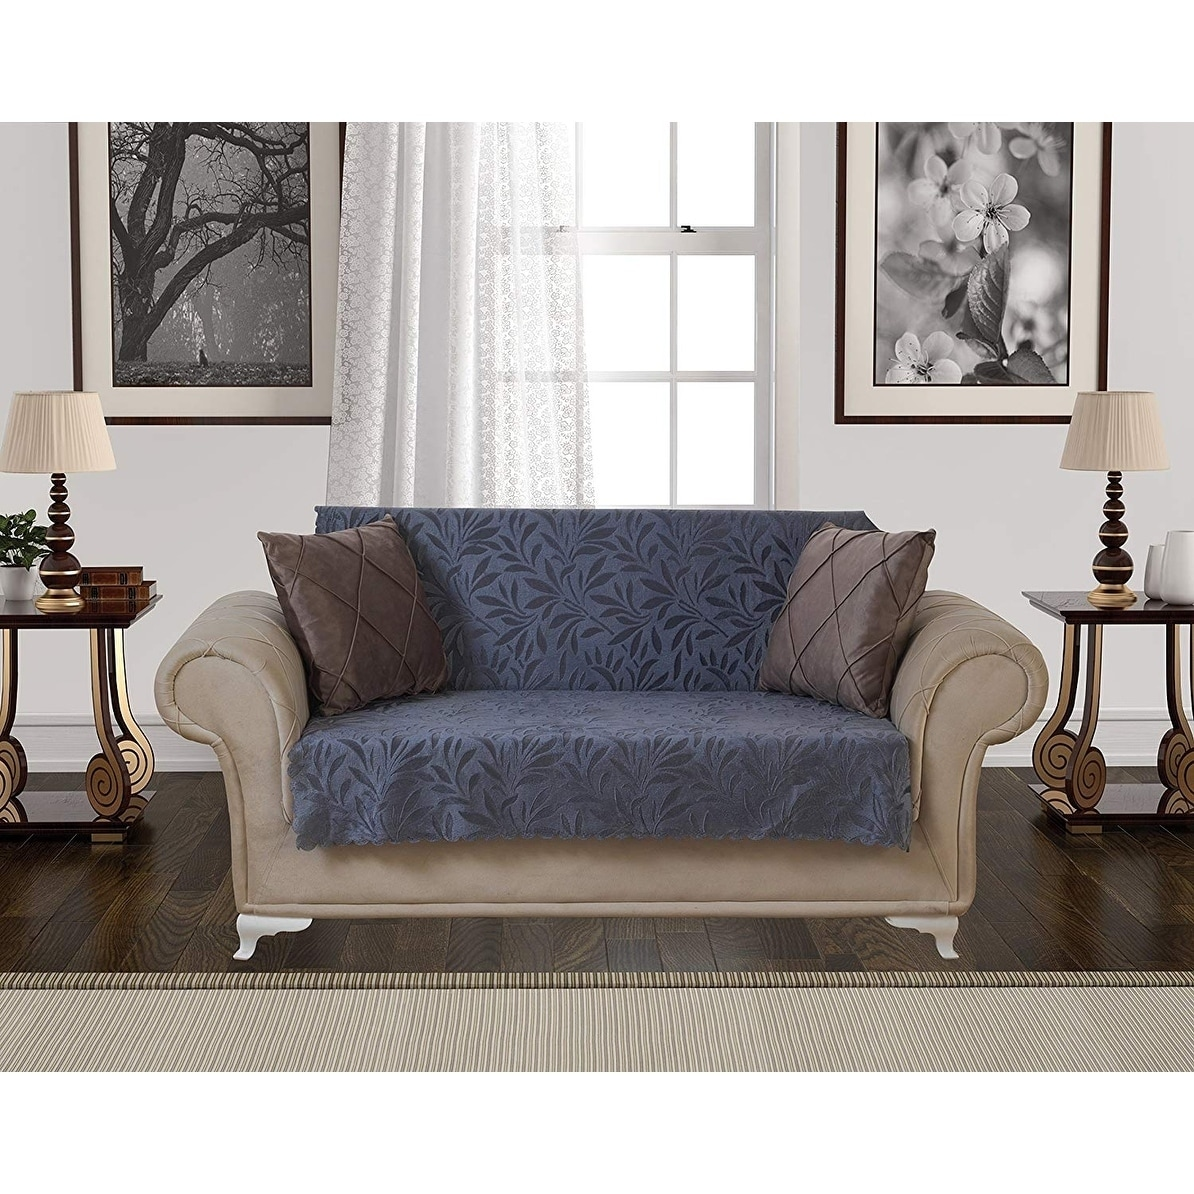 Chiara Rose Acacia Loveseat Slipcover 3 Cushion Sofa Cover 1 Piece Couch Furniture Protector Tan